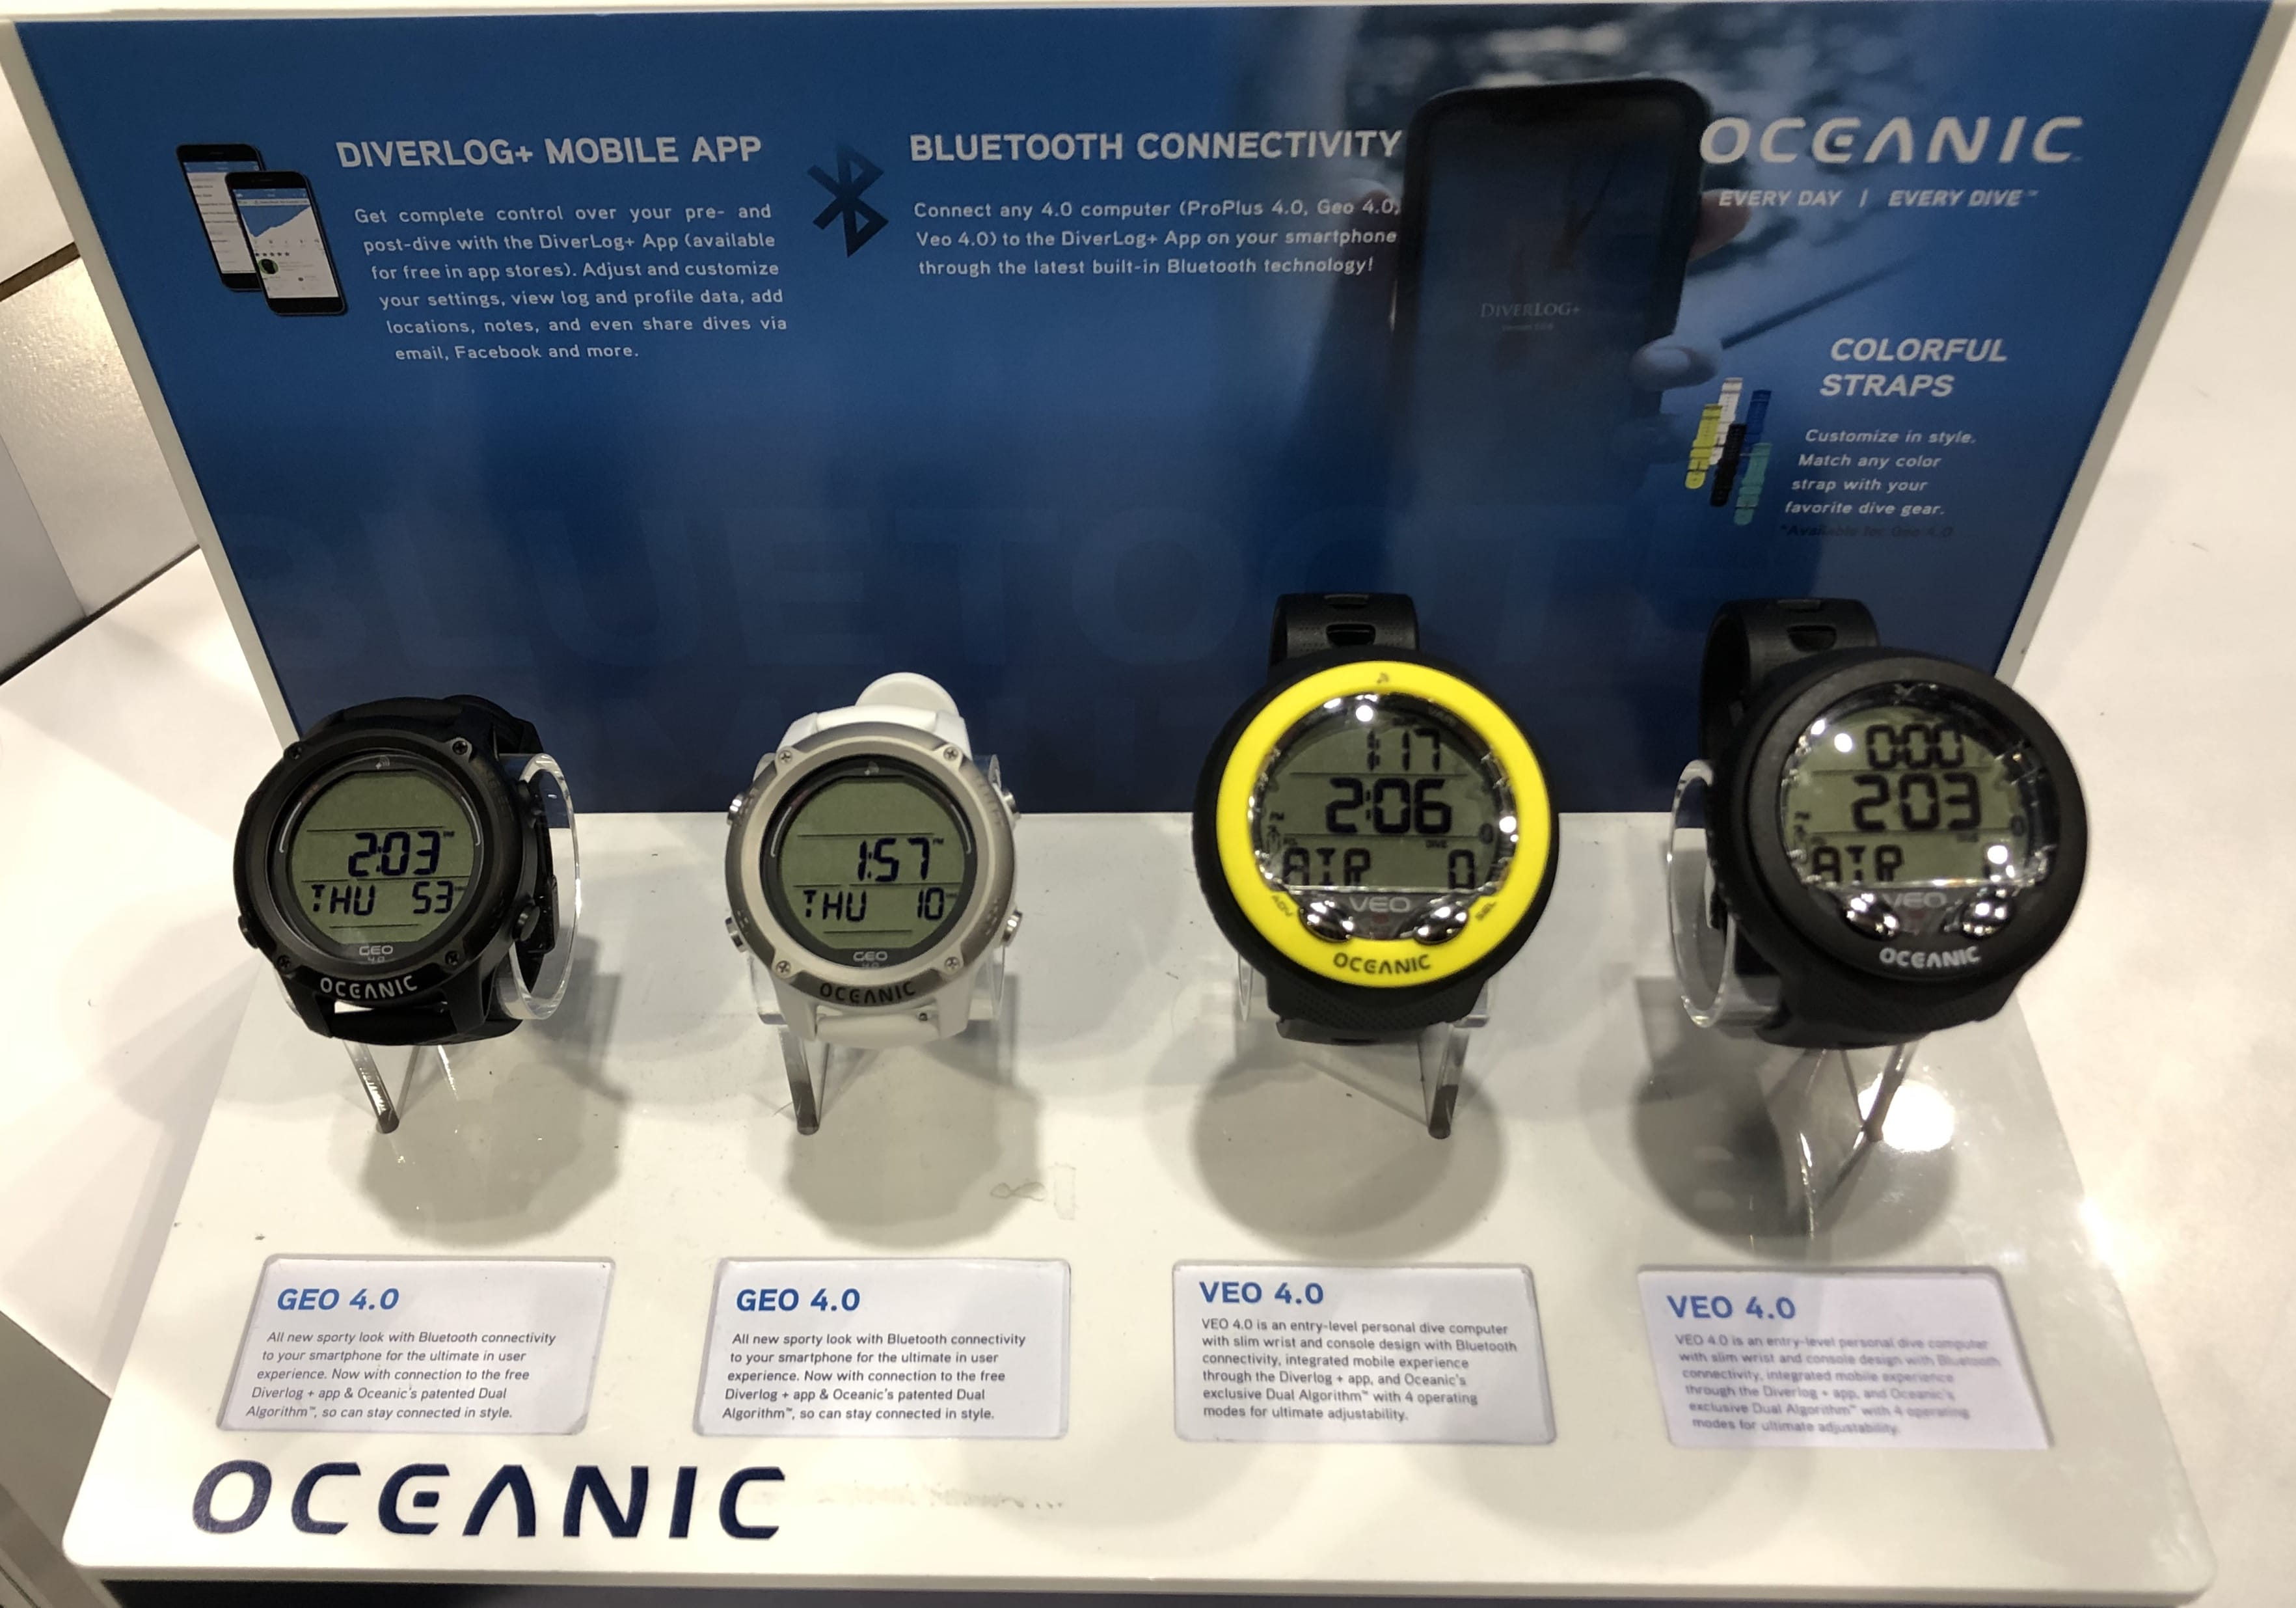 Oceanic's dive computers at DEMA Show 2019